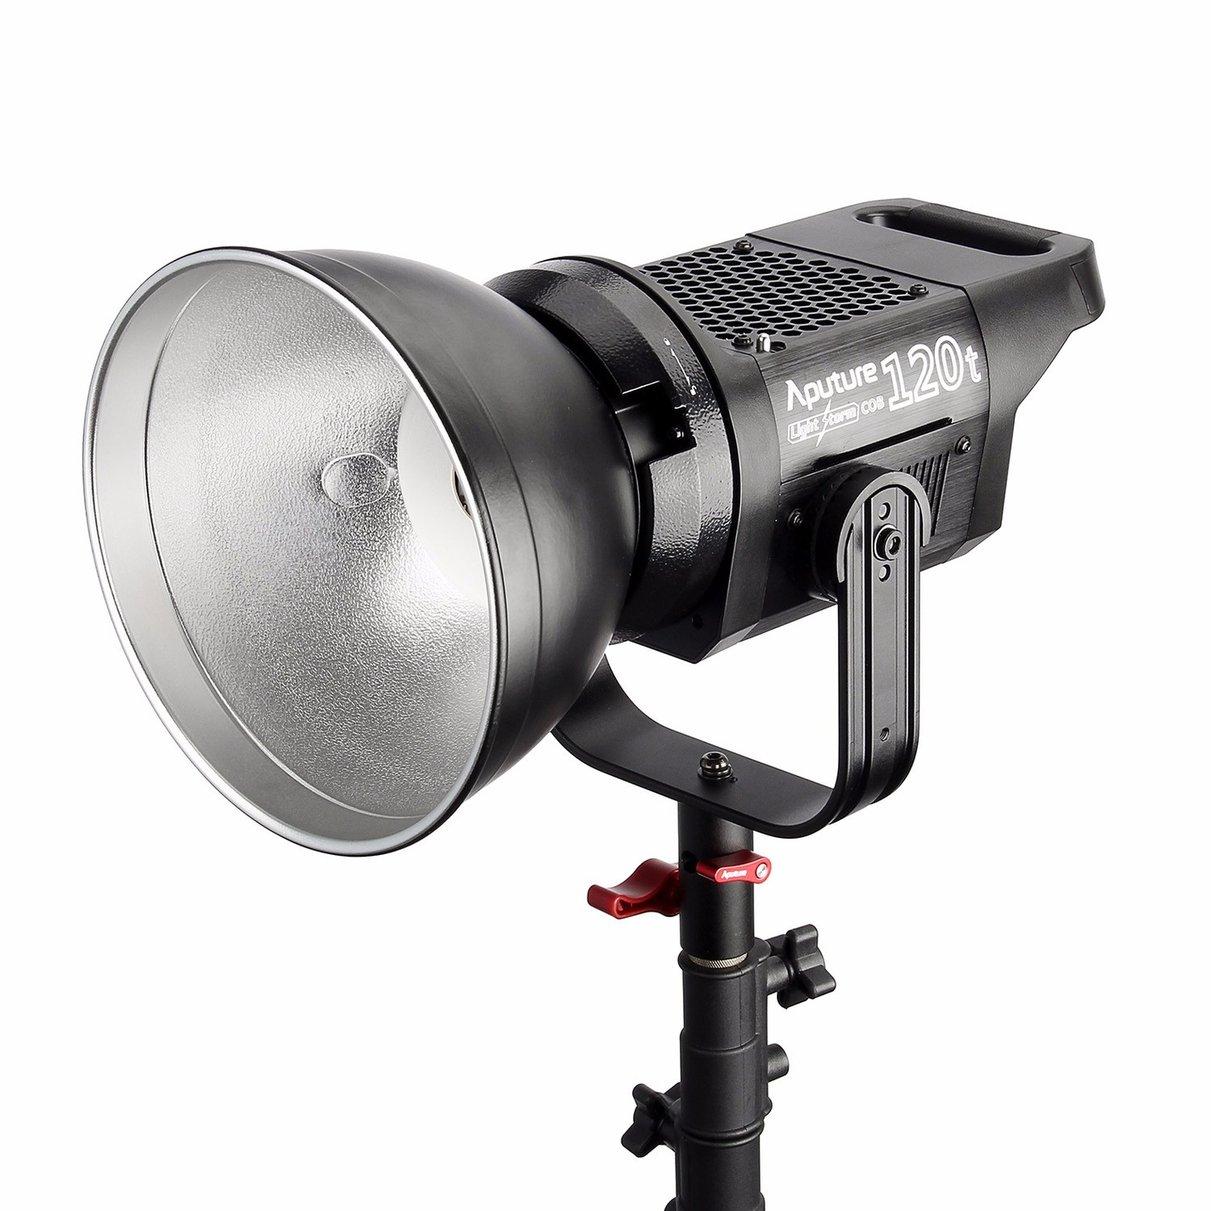 Aputure ¿C120t luz tormenta 135 W CRI moren que 97 LED Video Studio Luz de montaje en V Bowen